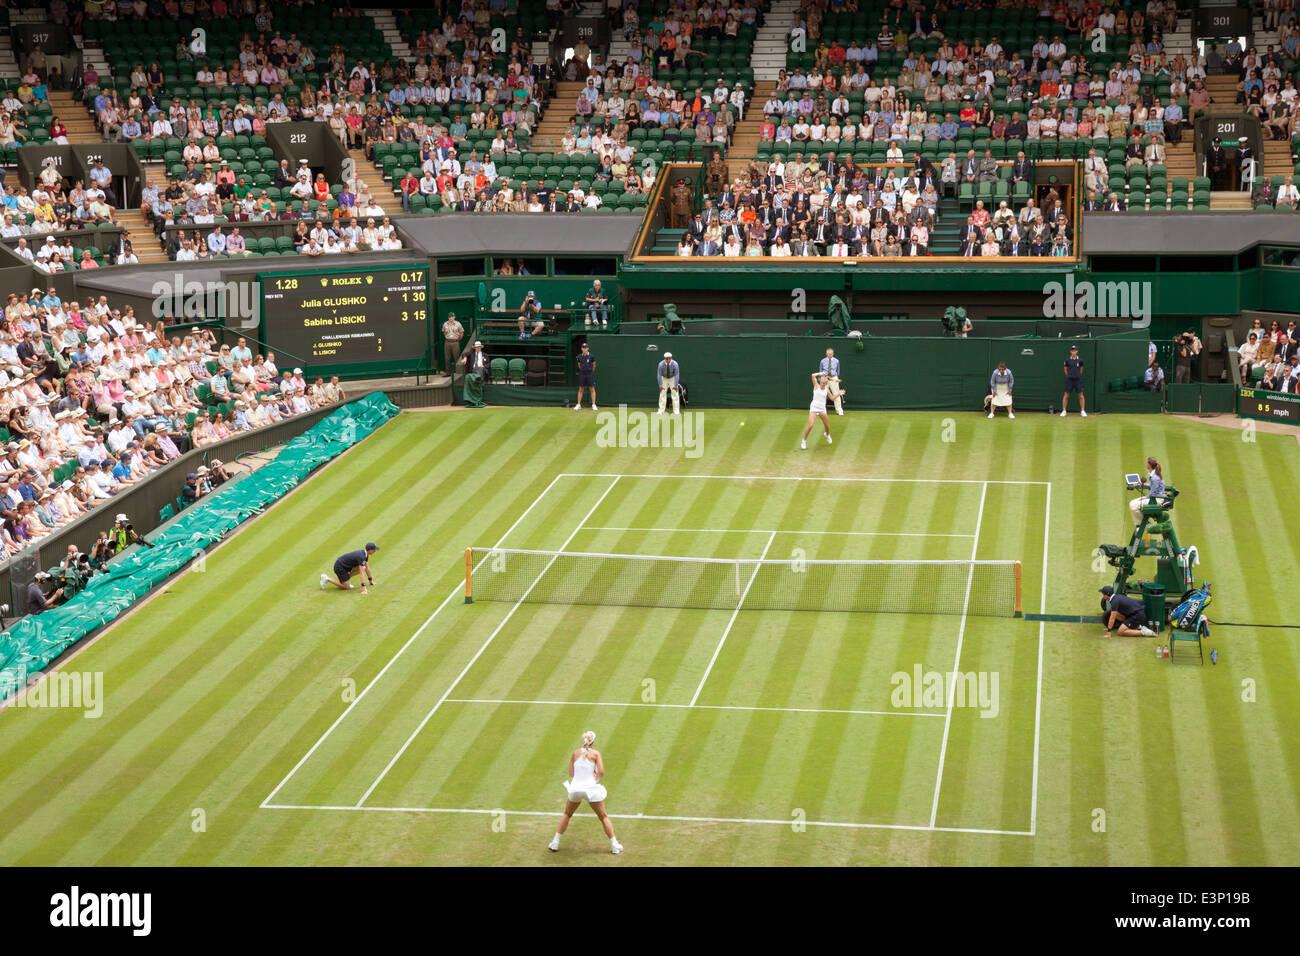 Ladies Singles match 2014 championship on Centre Court, Wimbledon, All England Lawn Tennis Club; Wimbledon London - Stock Image